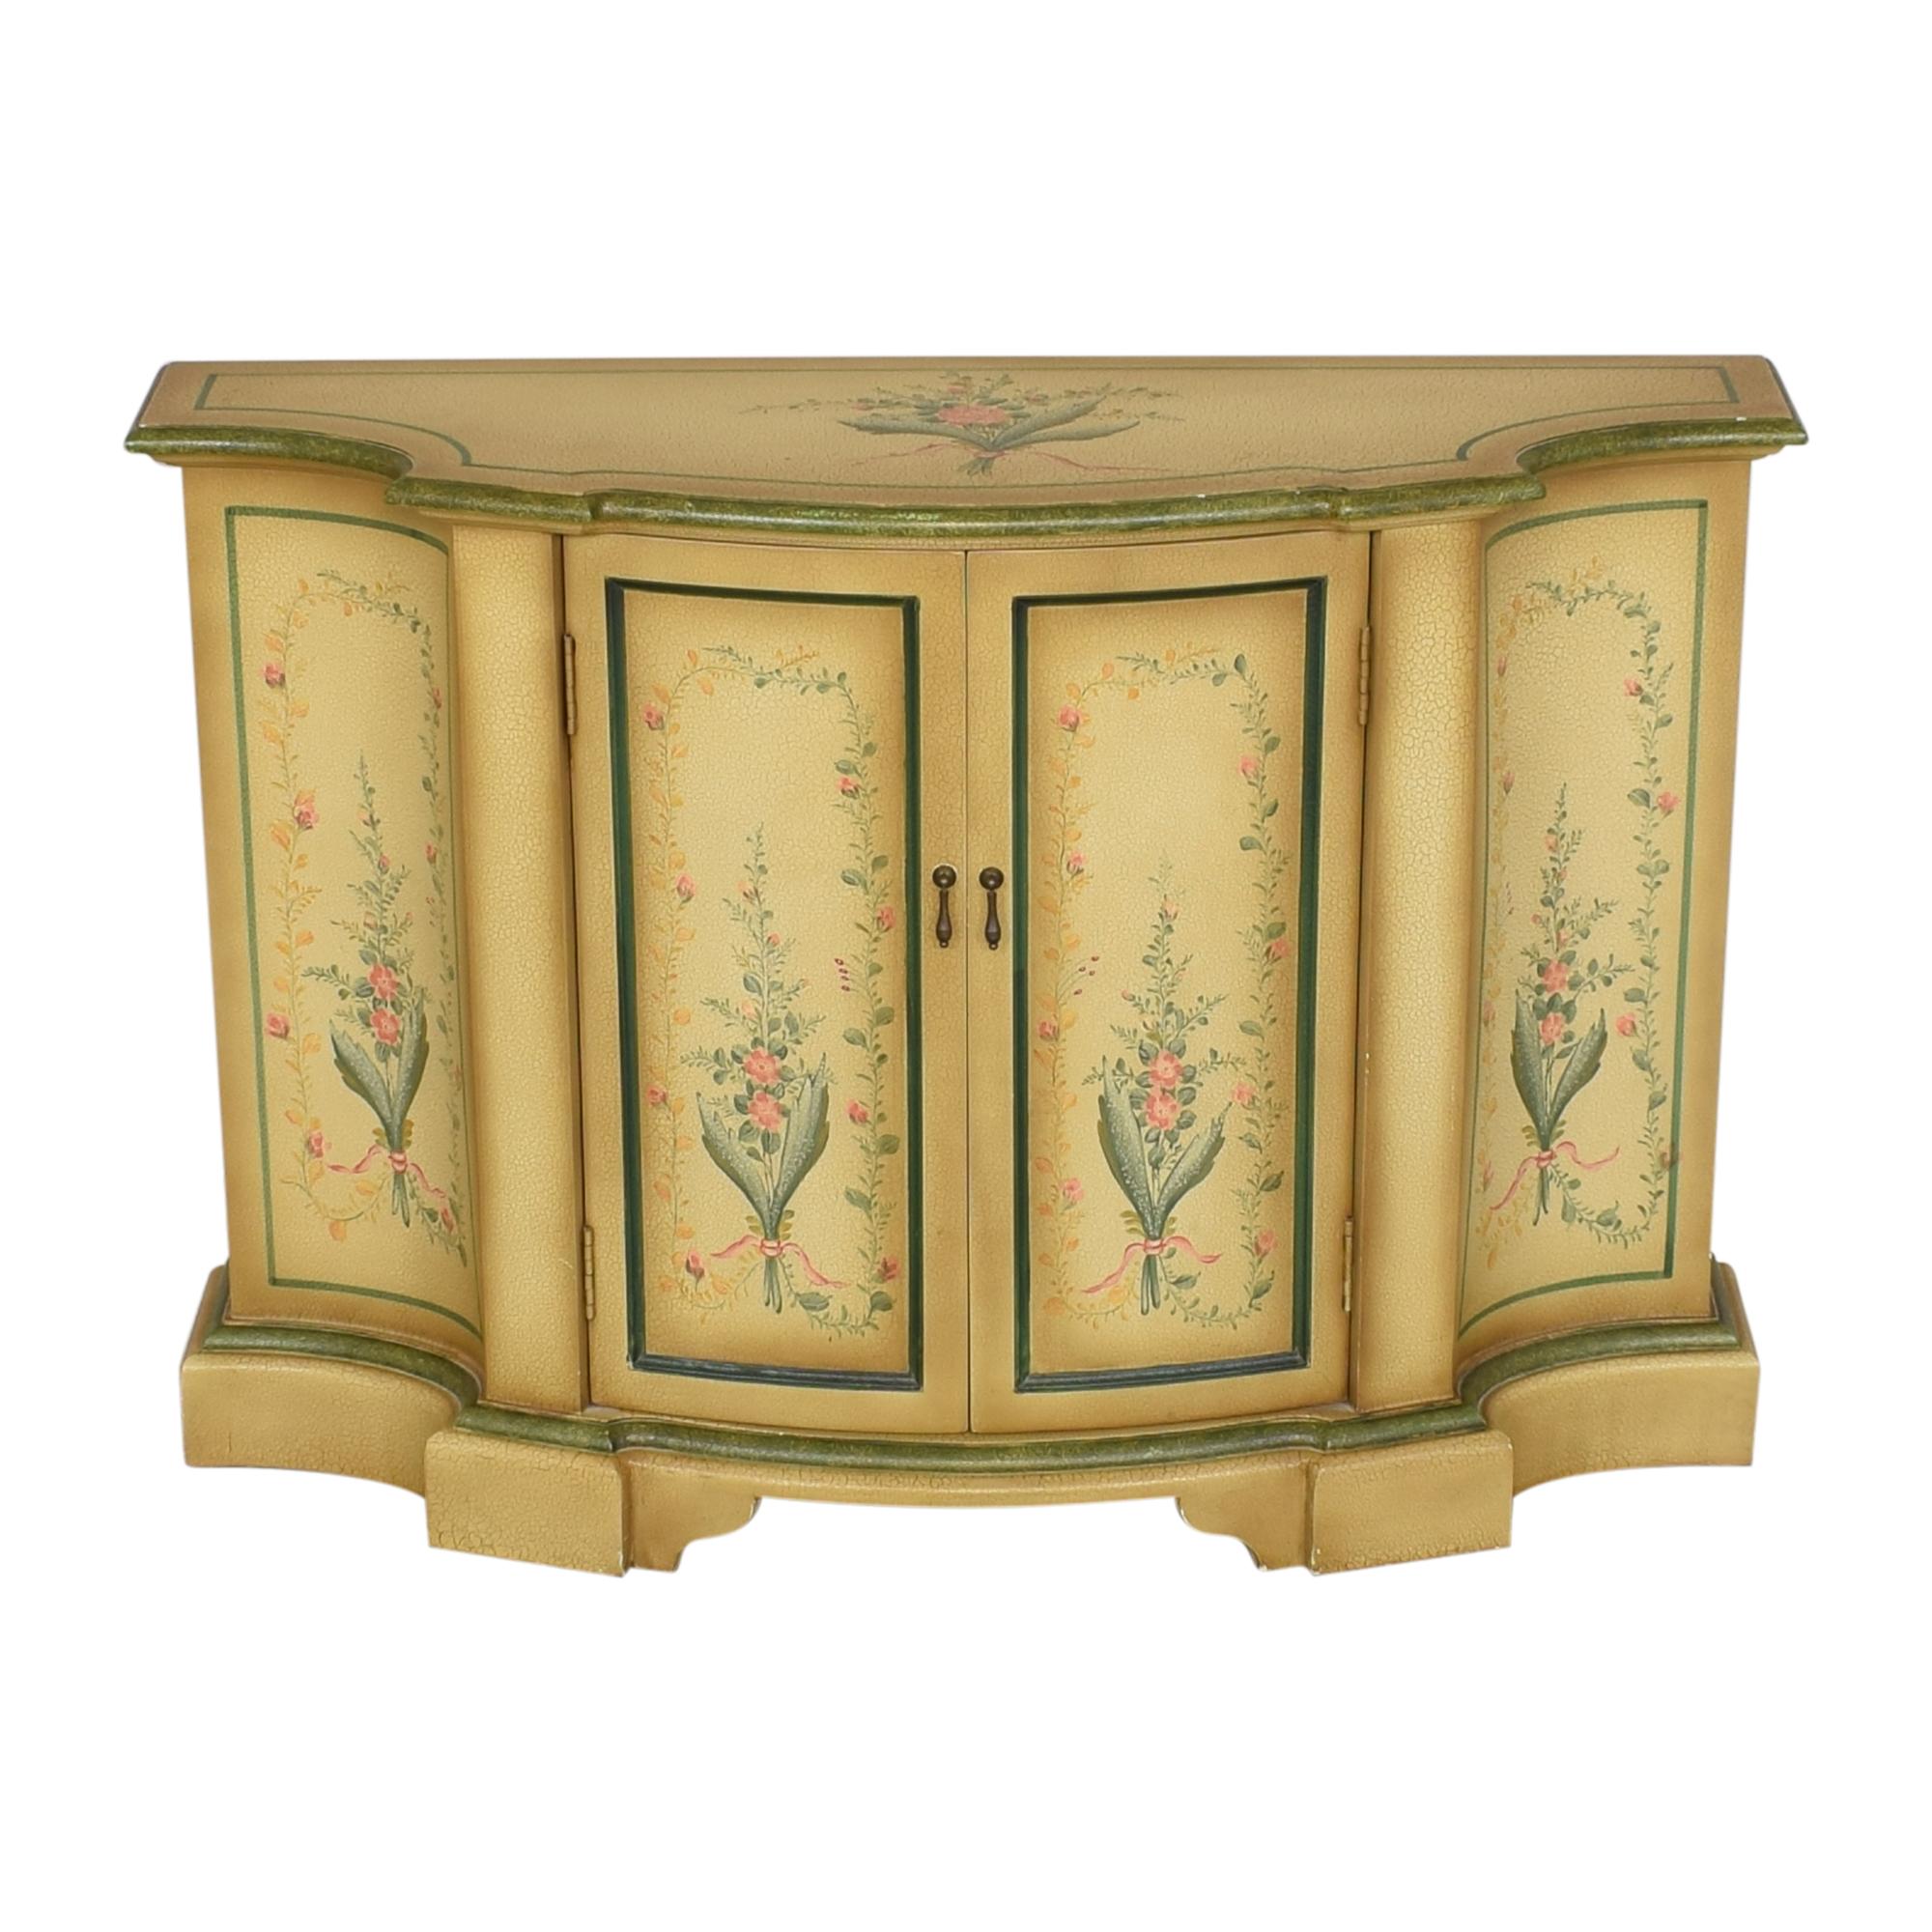 Vintage Painted Sideboard Credenza for sale